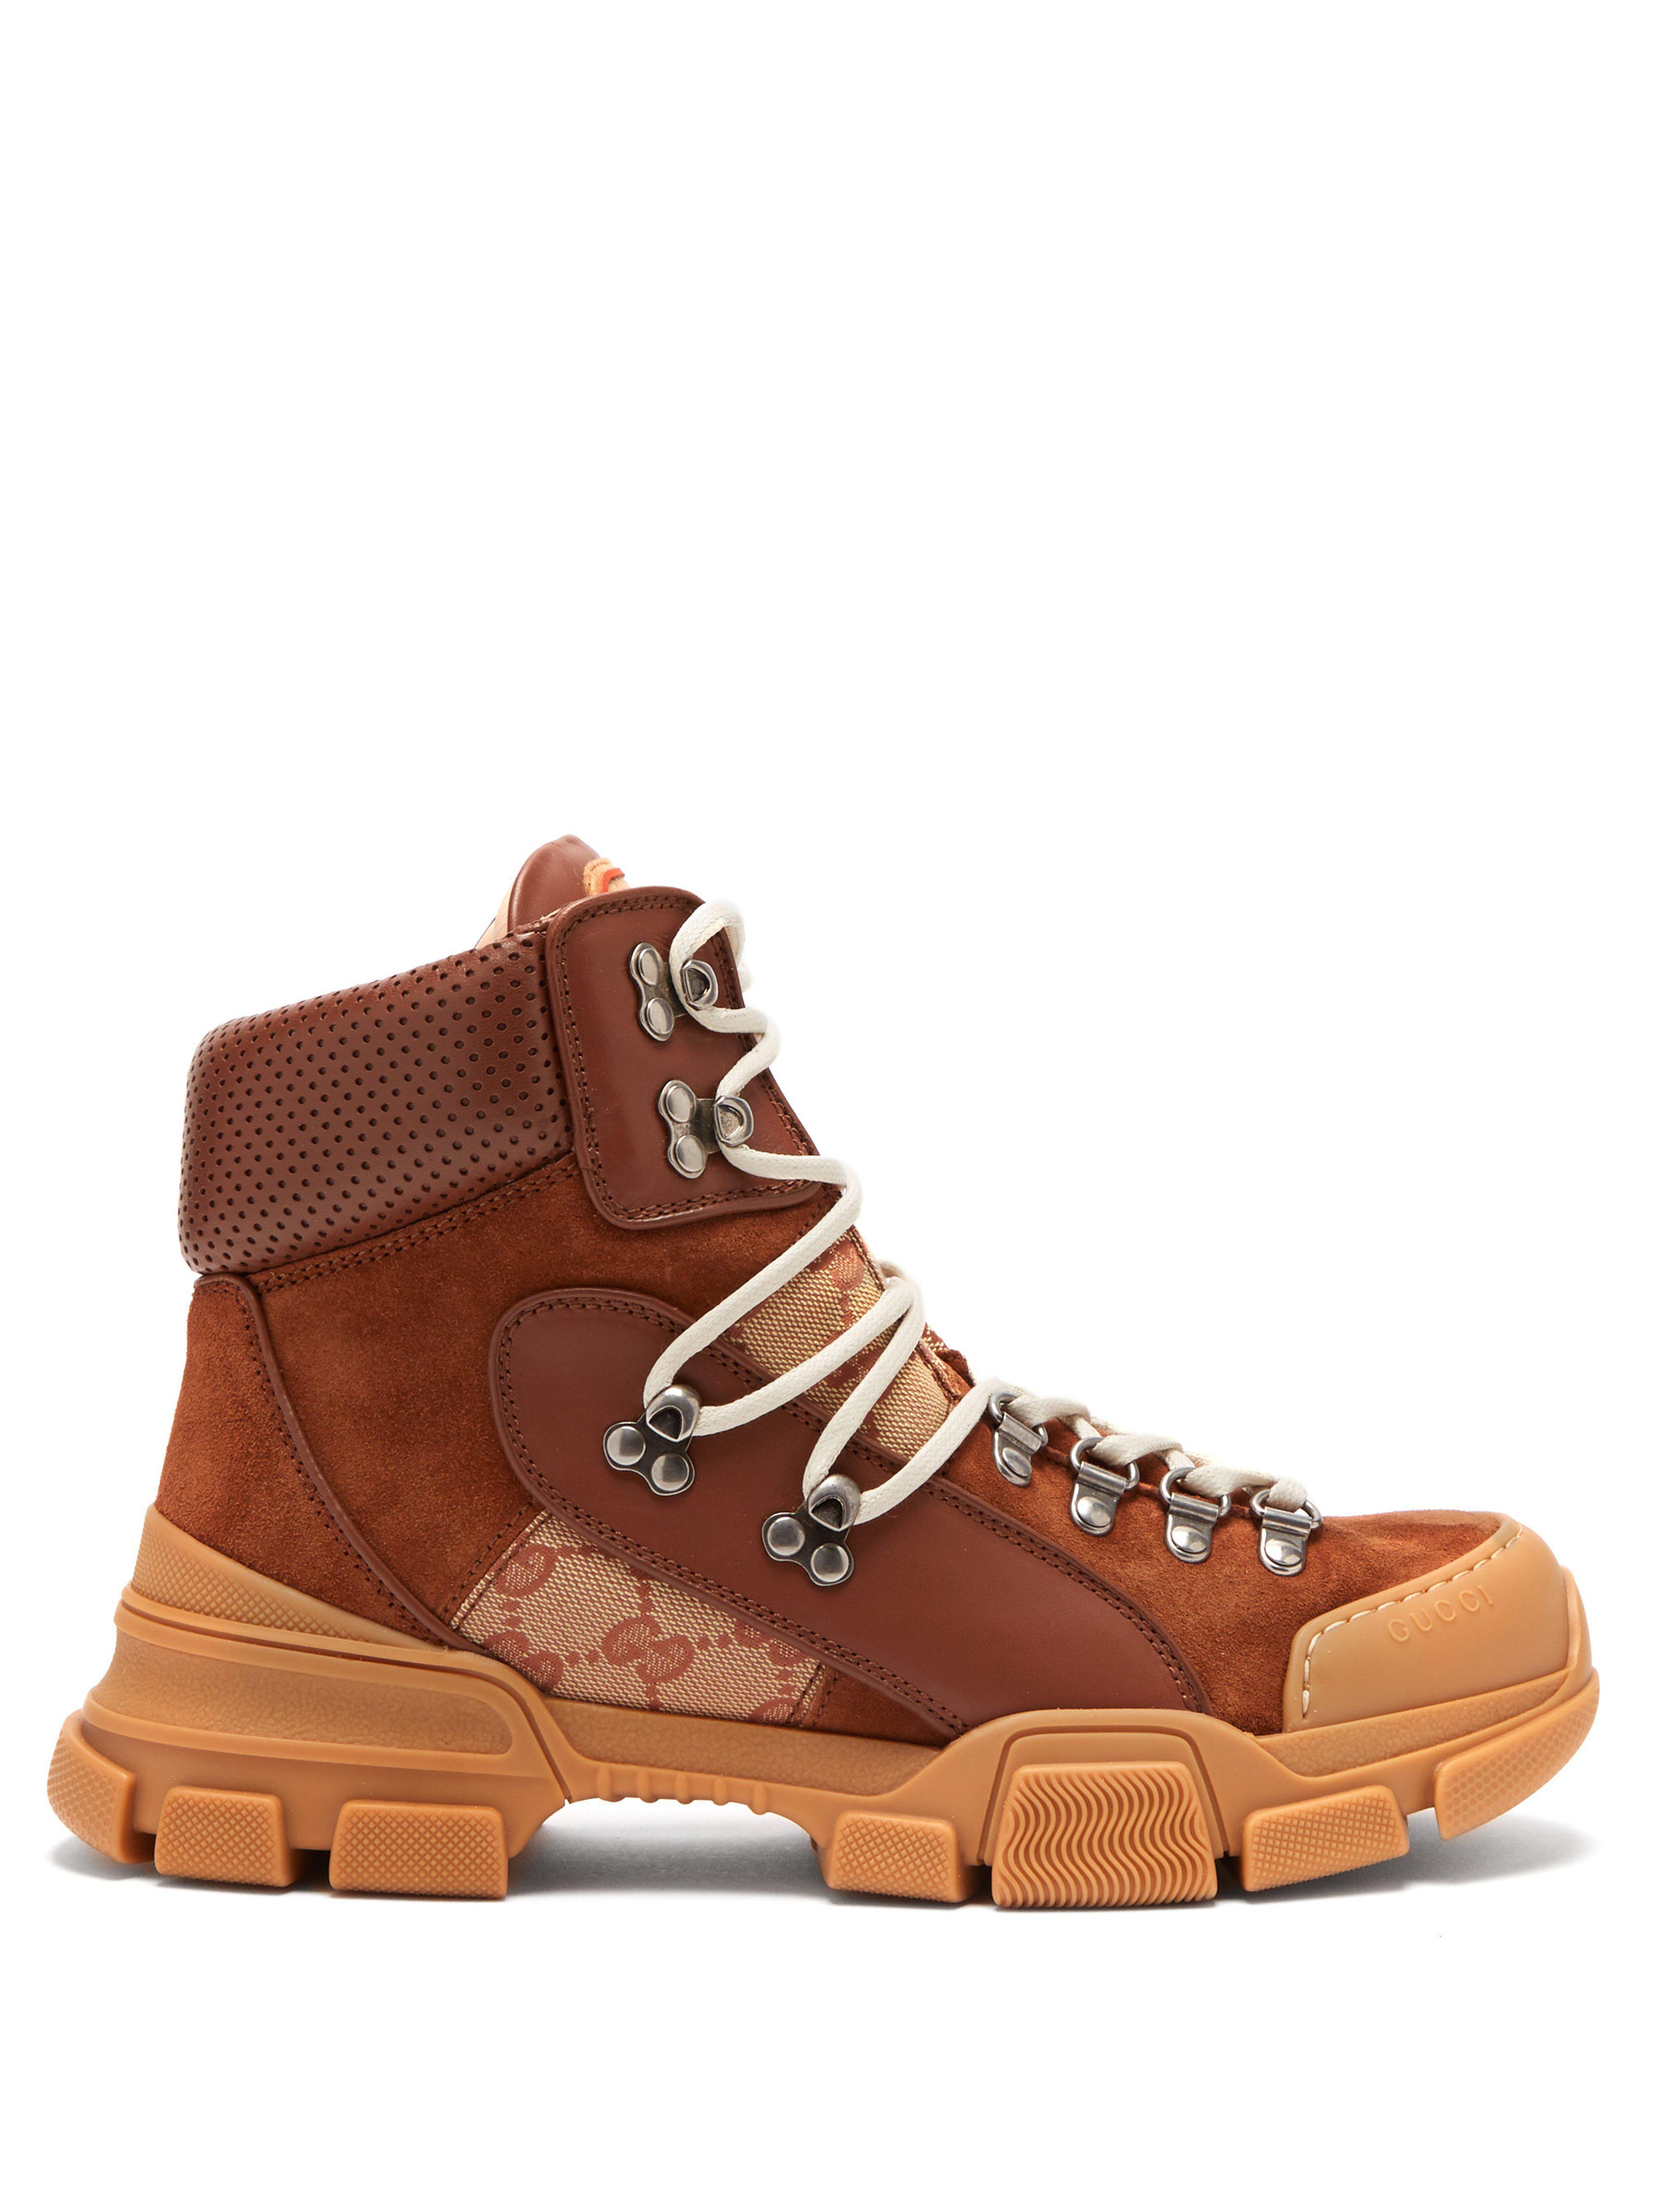 c1399463f93e Gucci - Brown Flashtrek GG High-top Sneakers - Lyst. View fullscreen